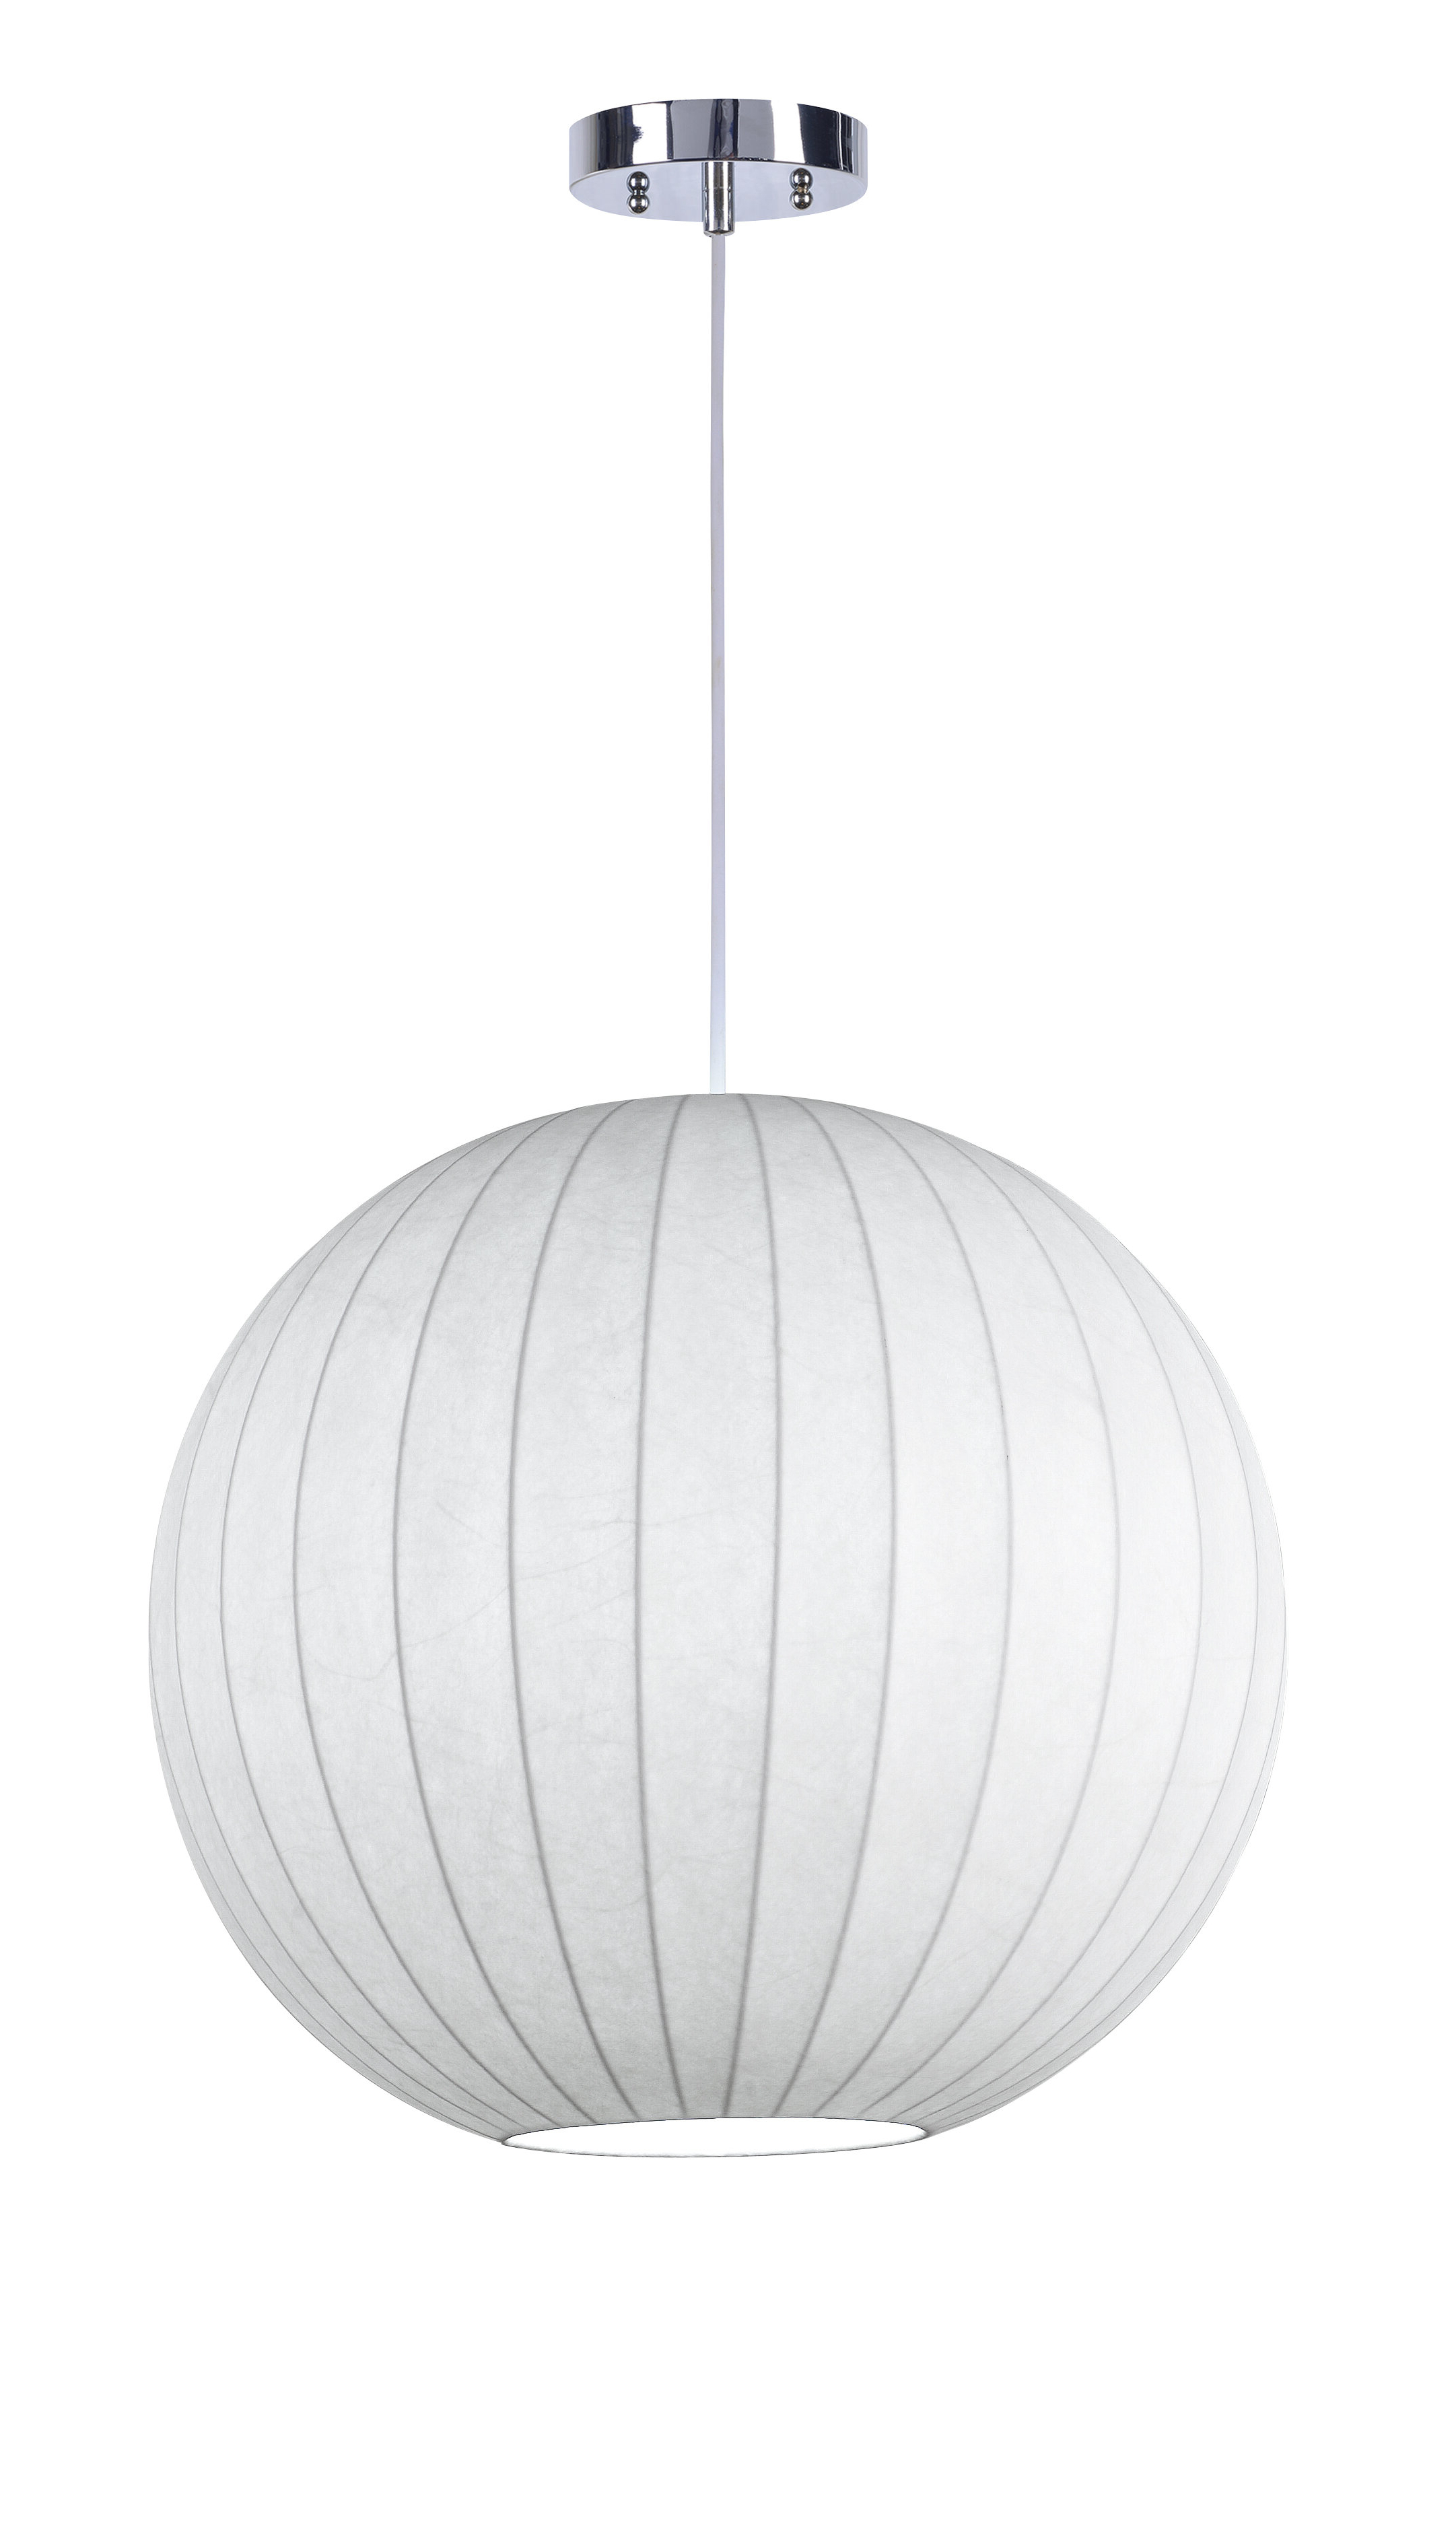 1 Light Globe Pendants Pertaining To 2019 Suzette 1 Light Globe Pendant (View 3 of 20)